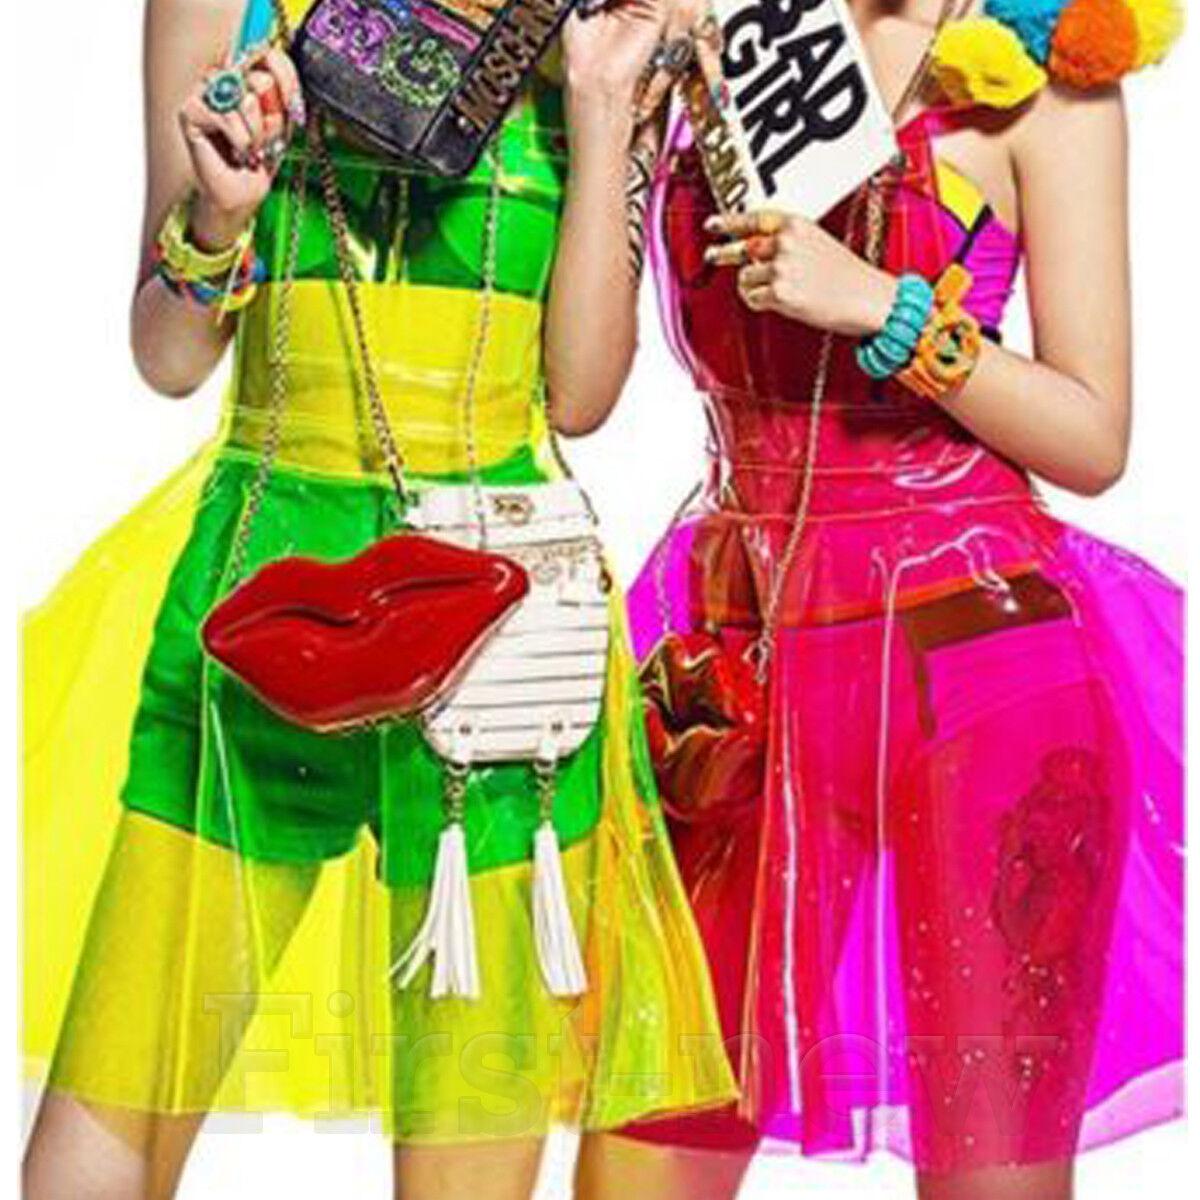 Lady Soft Vinly PVC Dress Women Clear Hologram Performance Plastic Jelly Dresses